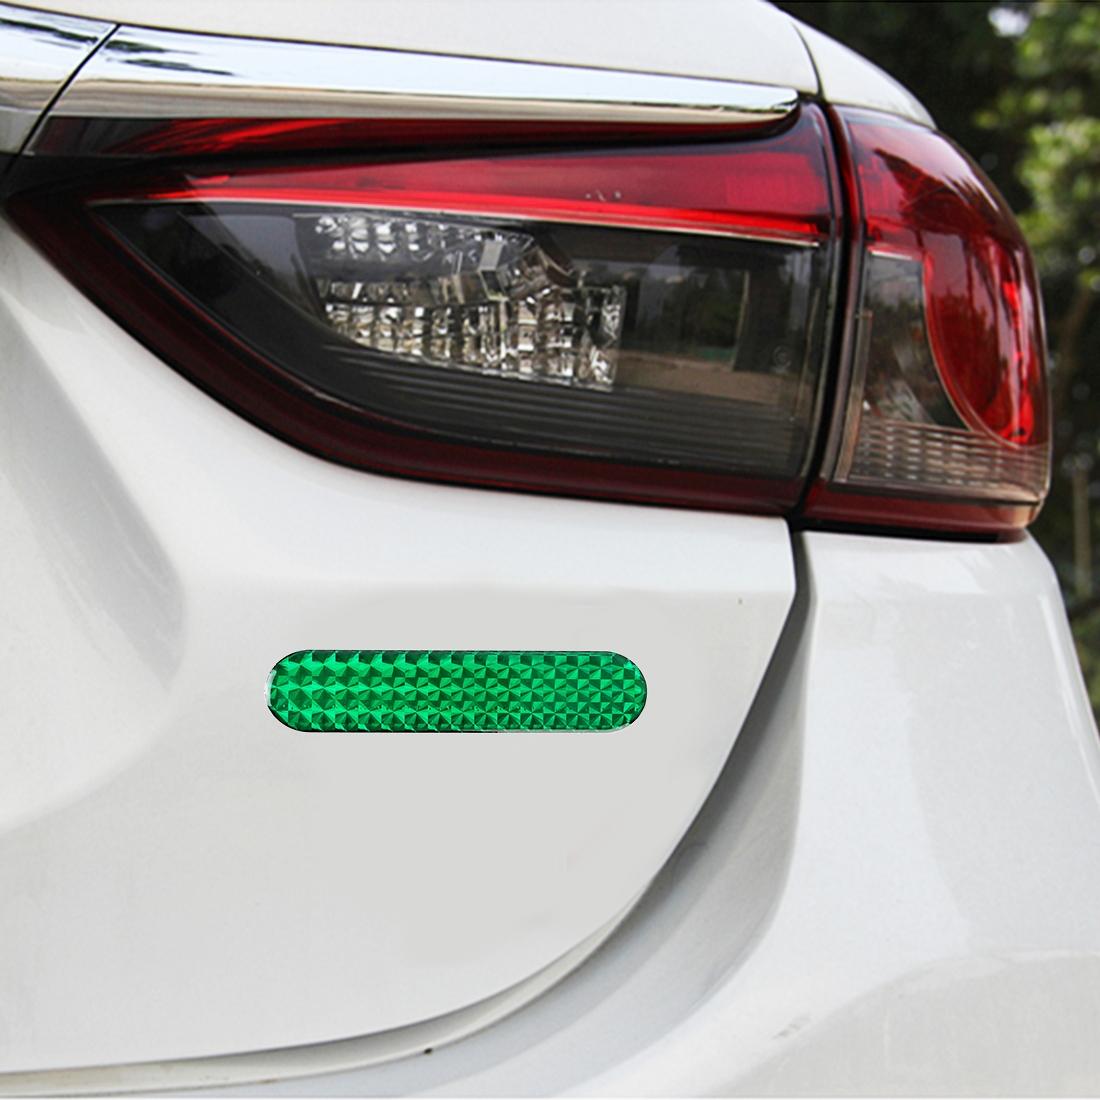 2 PCS High-brightness Laser Reflective Strip Warning Tape Decal Car Reflective Stickers Safety Mark (Green)